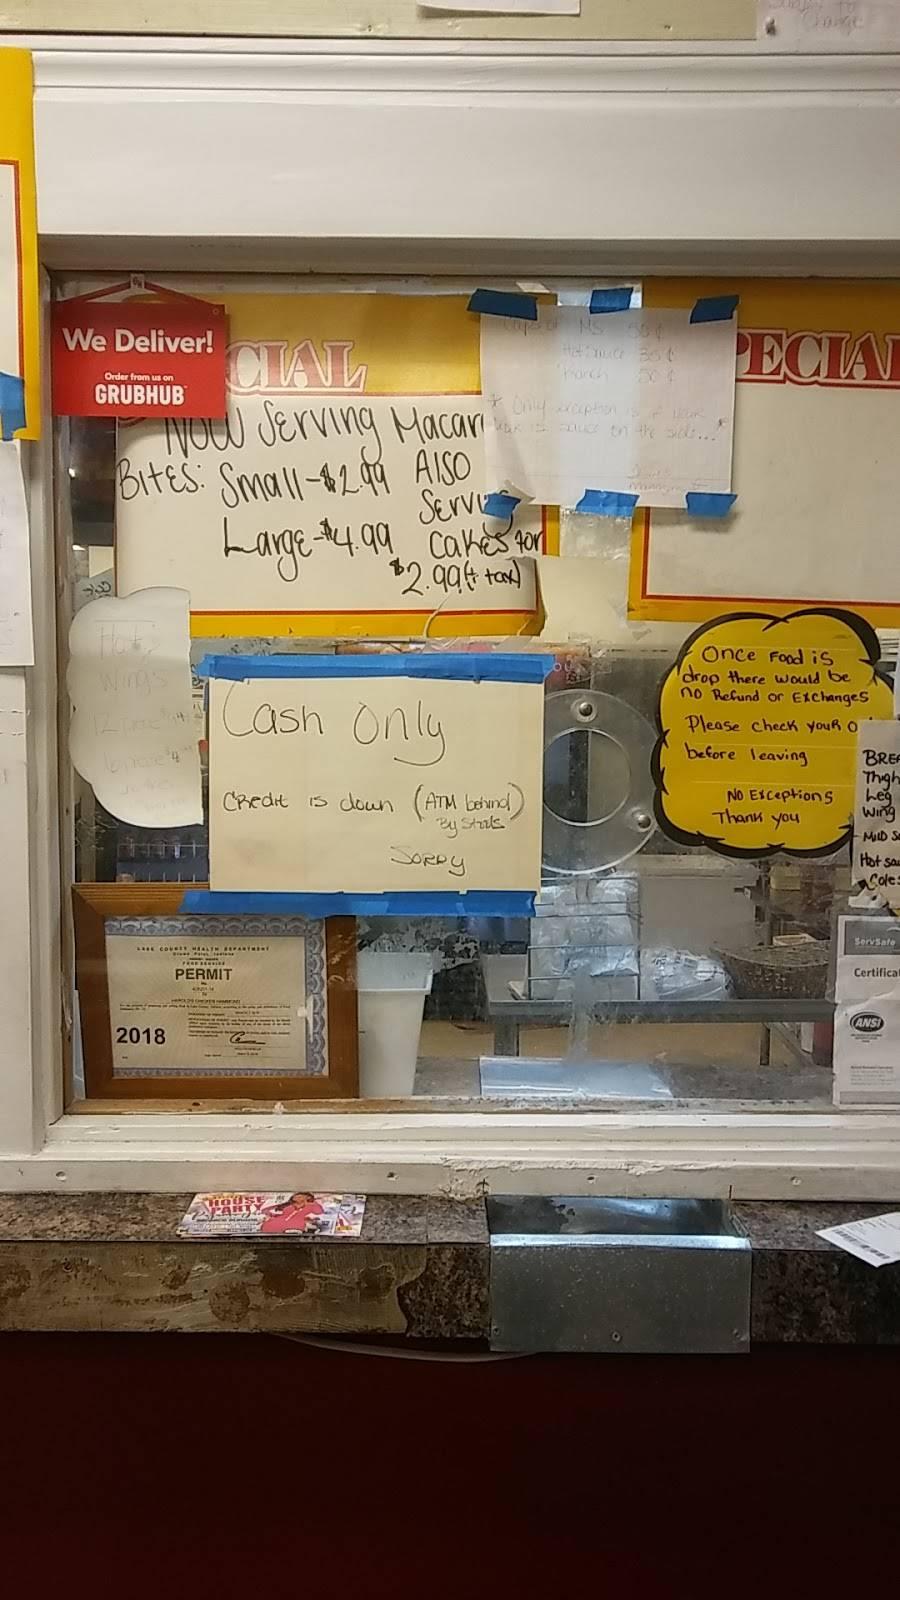 Harolds Chicken Shack   restaurant   6158 Indianapolis Blvd, Hammond, IN 46320, USA   2198032885 OR +1 219-803-2885